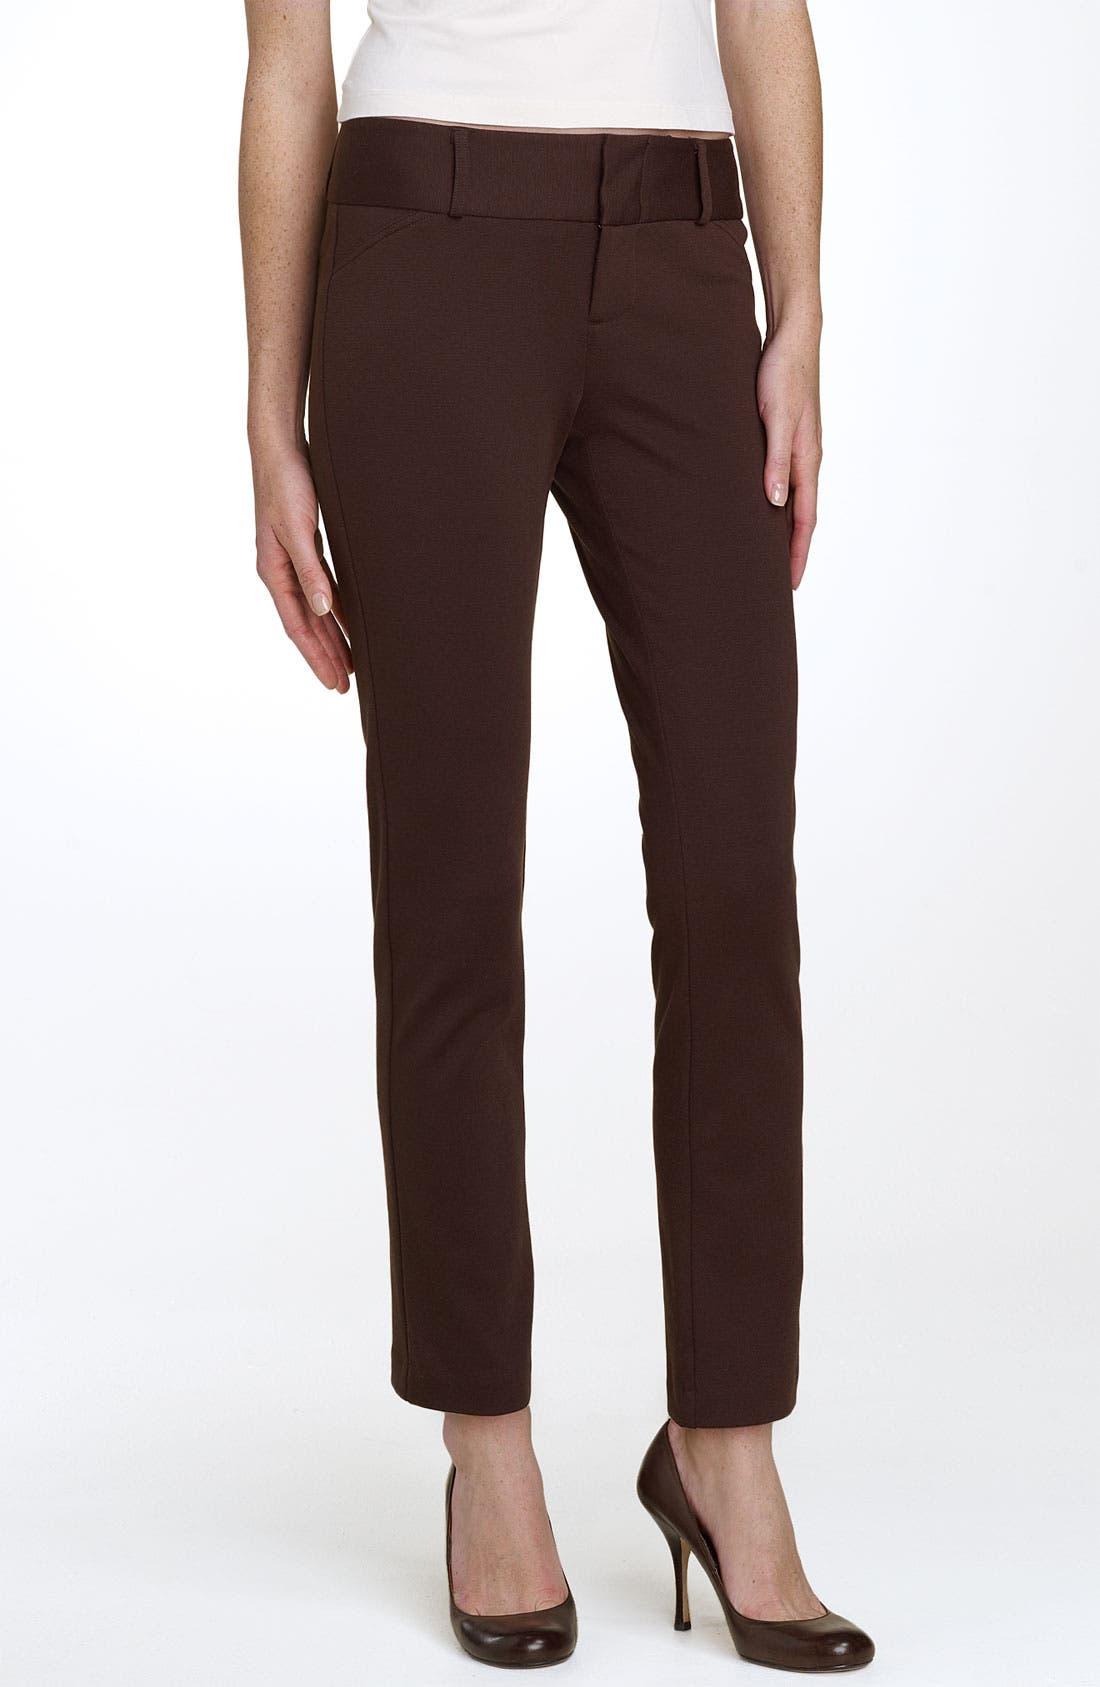 Alternate Image 1 Selected - MICHAEL Michael Kors Ponte Ankle Pants (Petite)